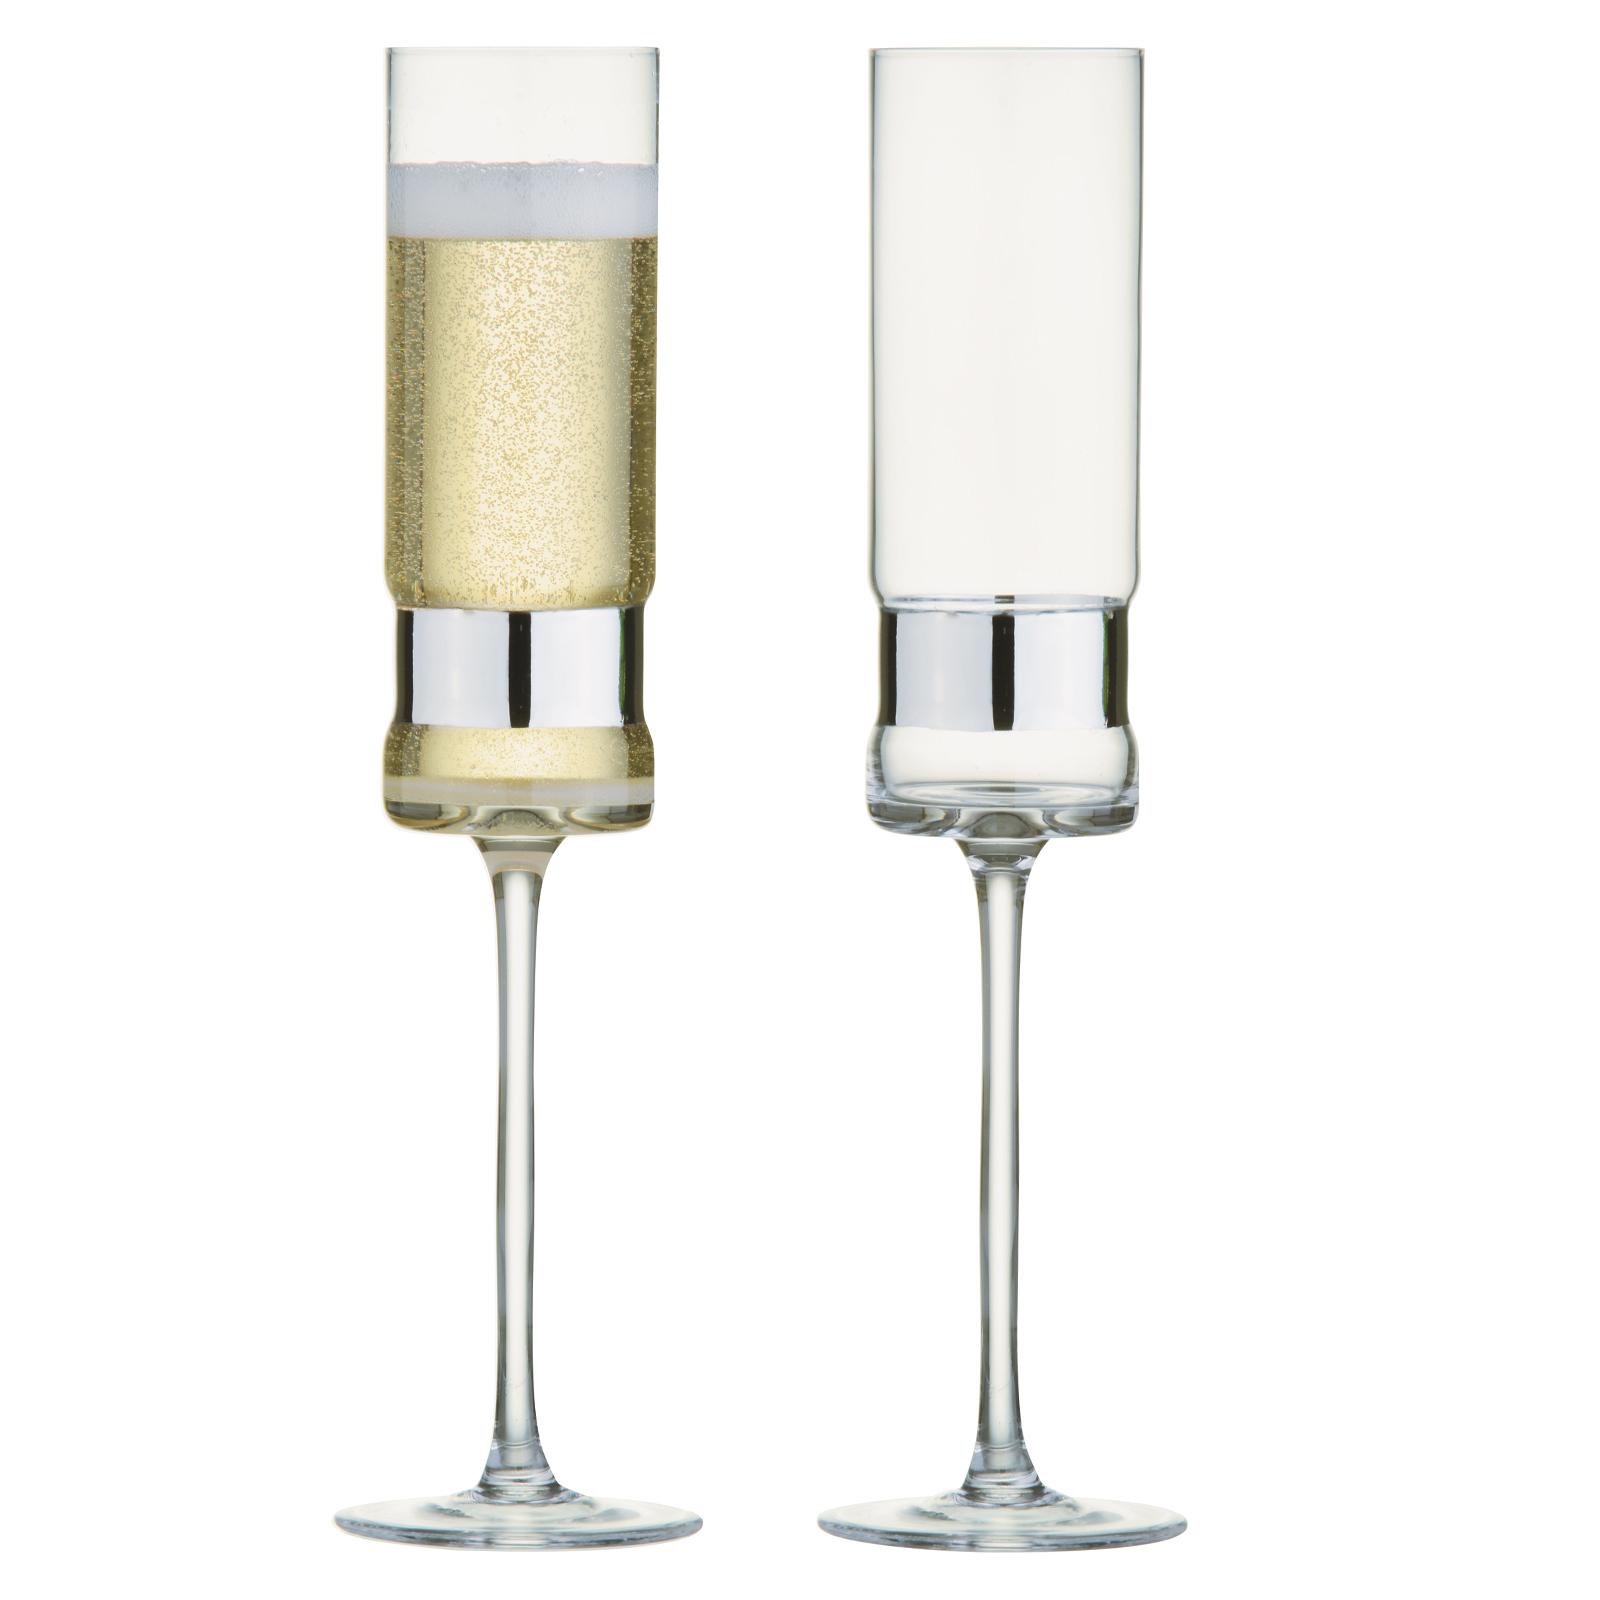 Set of 2 SoHo Champagne Flutes Silver